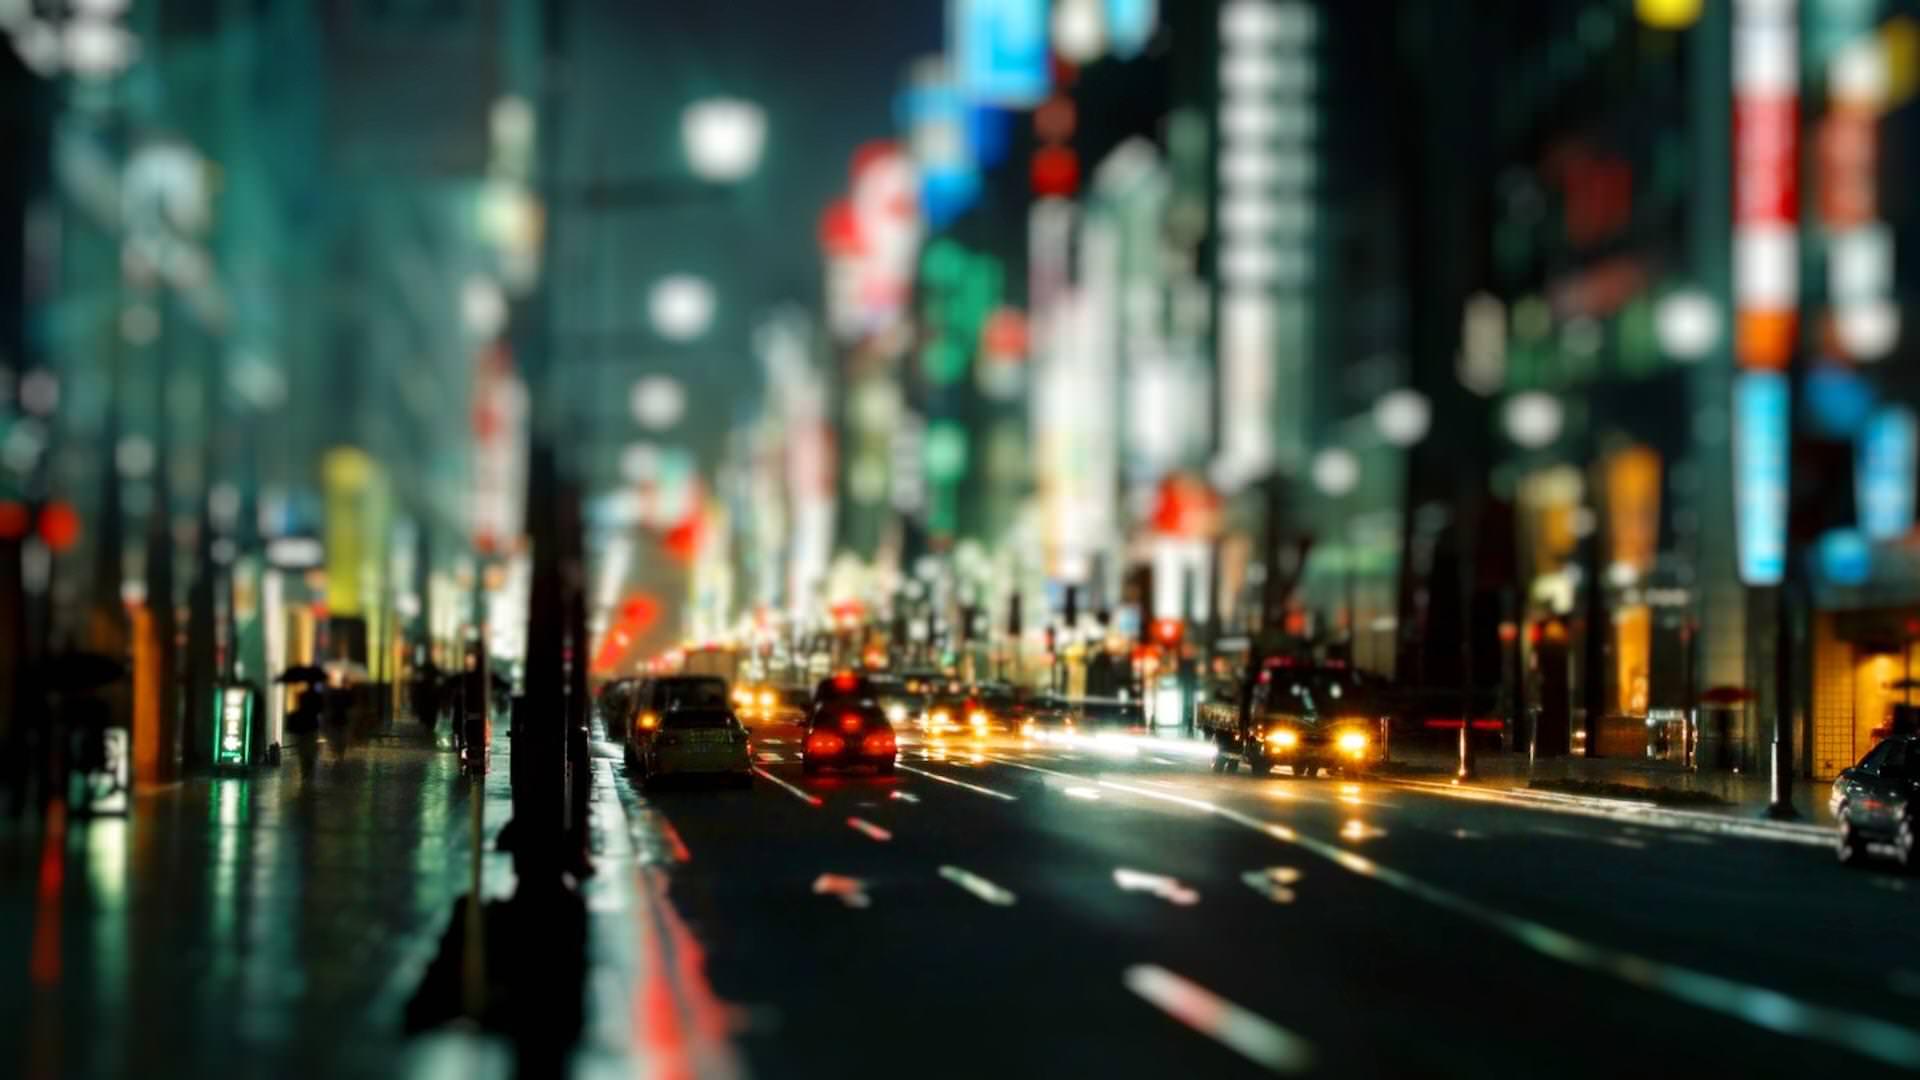 City Hazy Blurred Night Lights Wallpaper